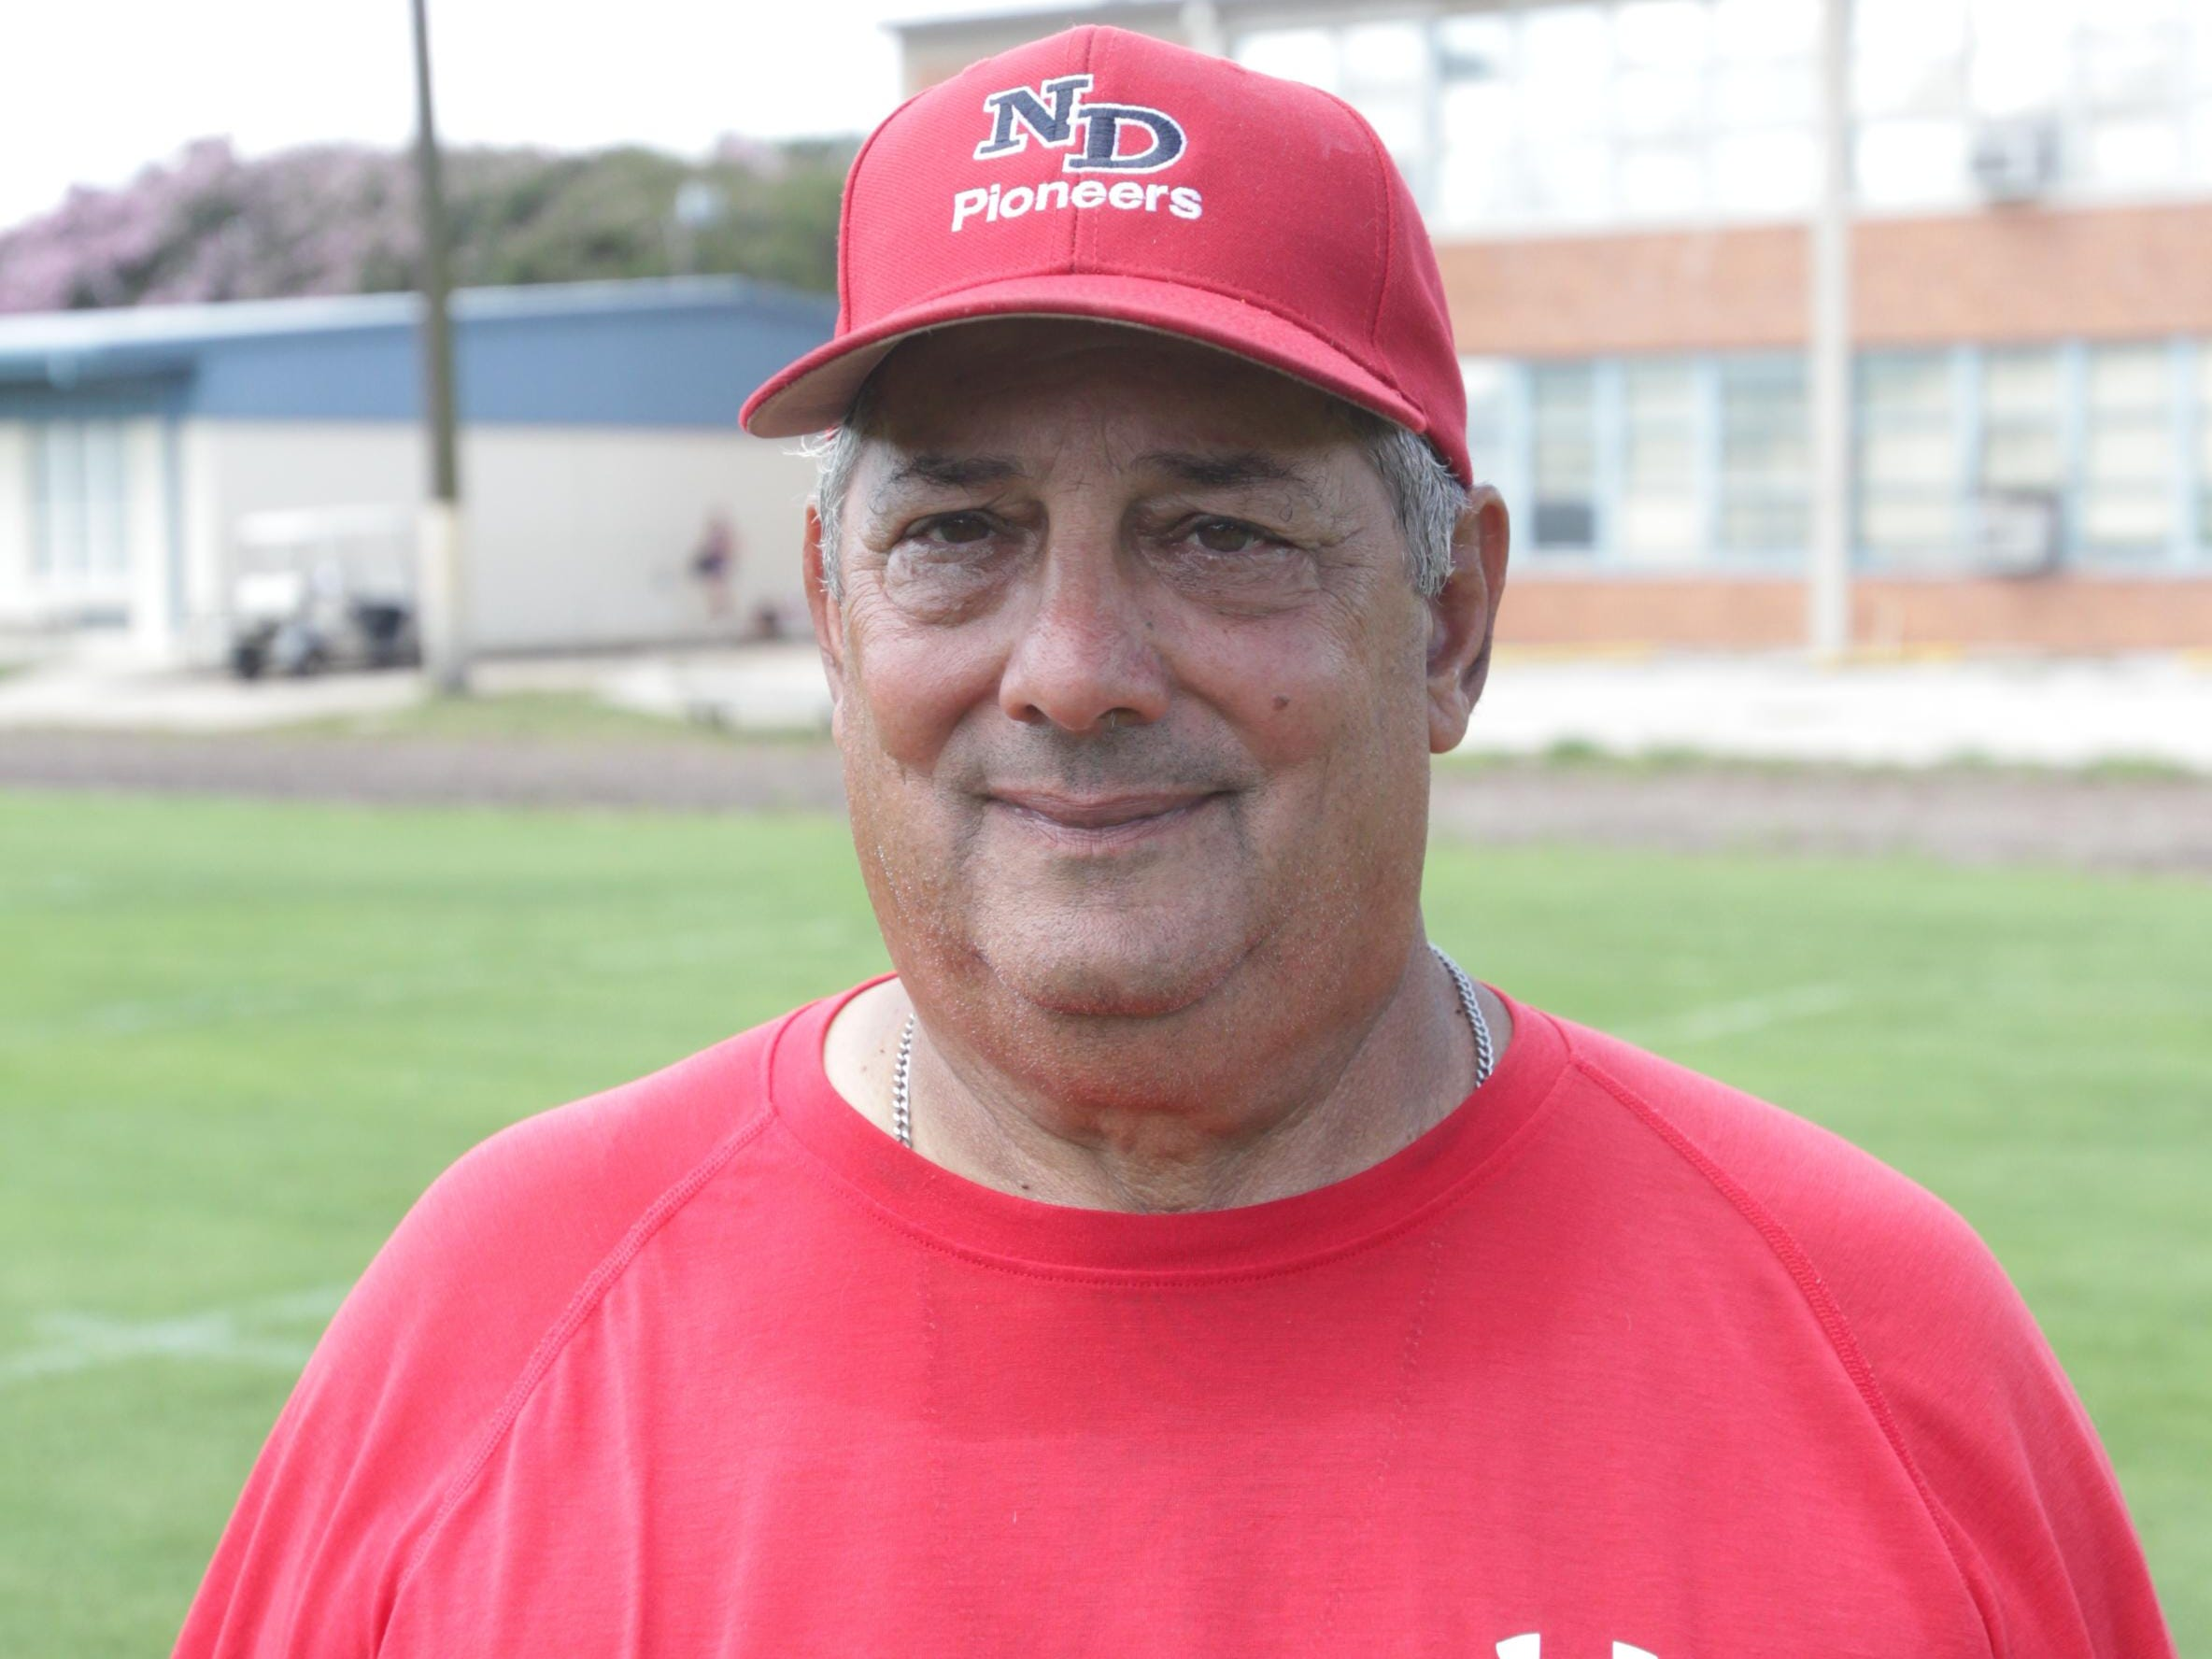 Notre Dame coach Lewis Cook